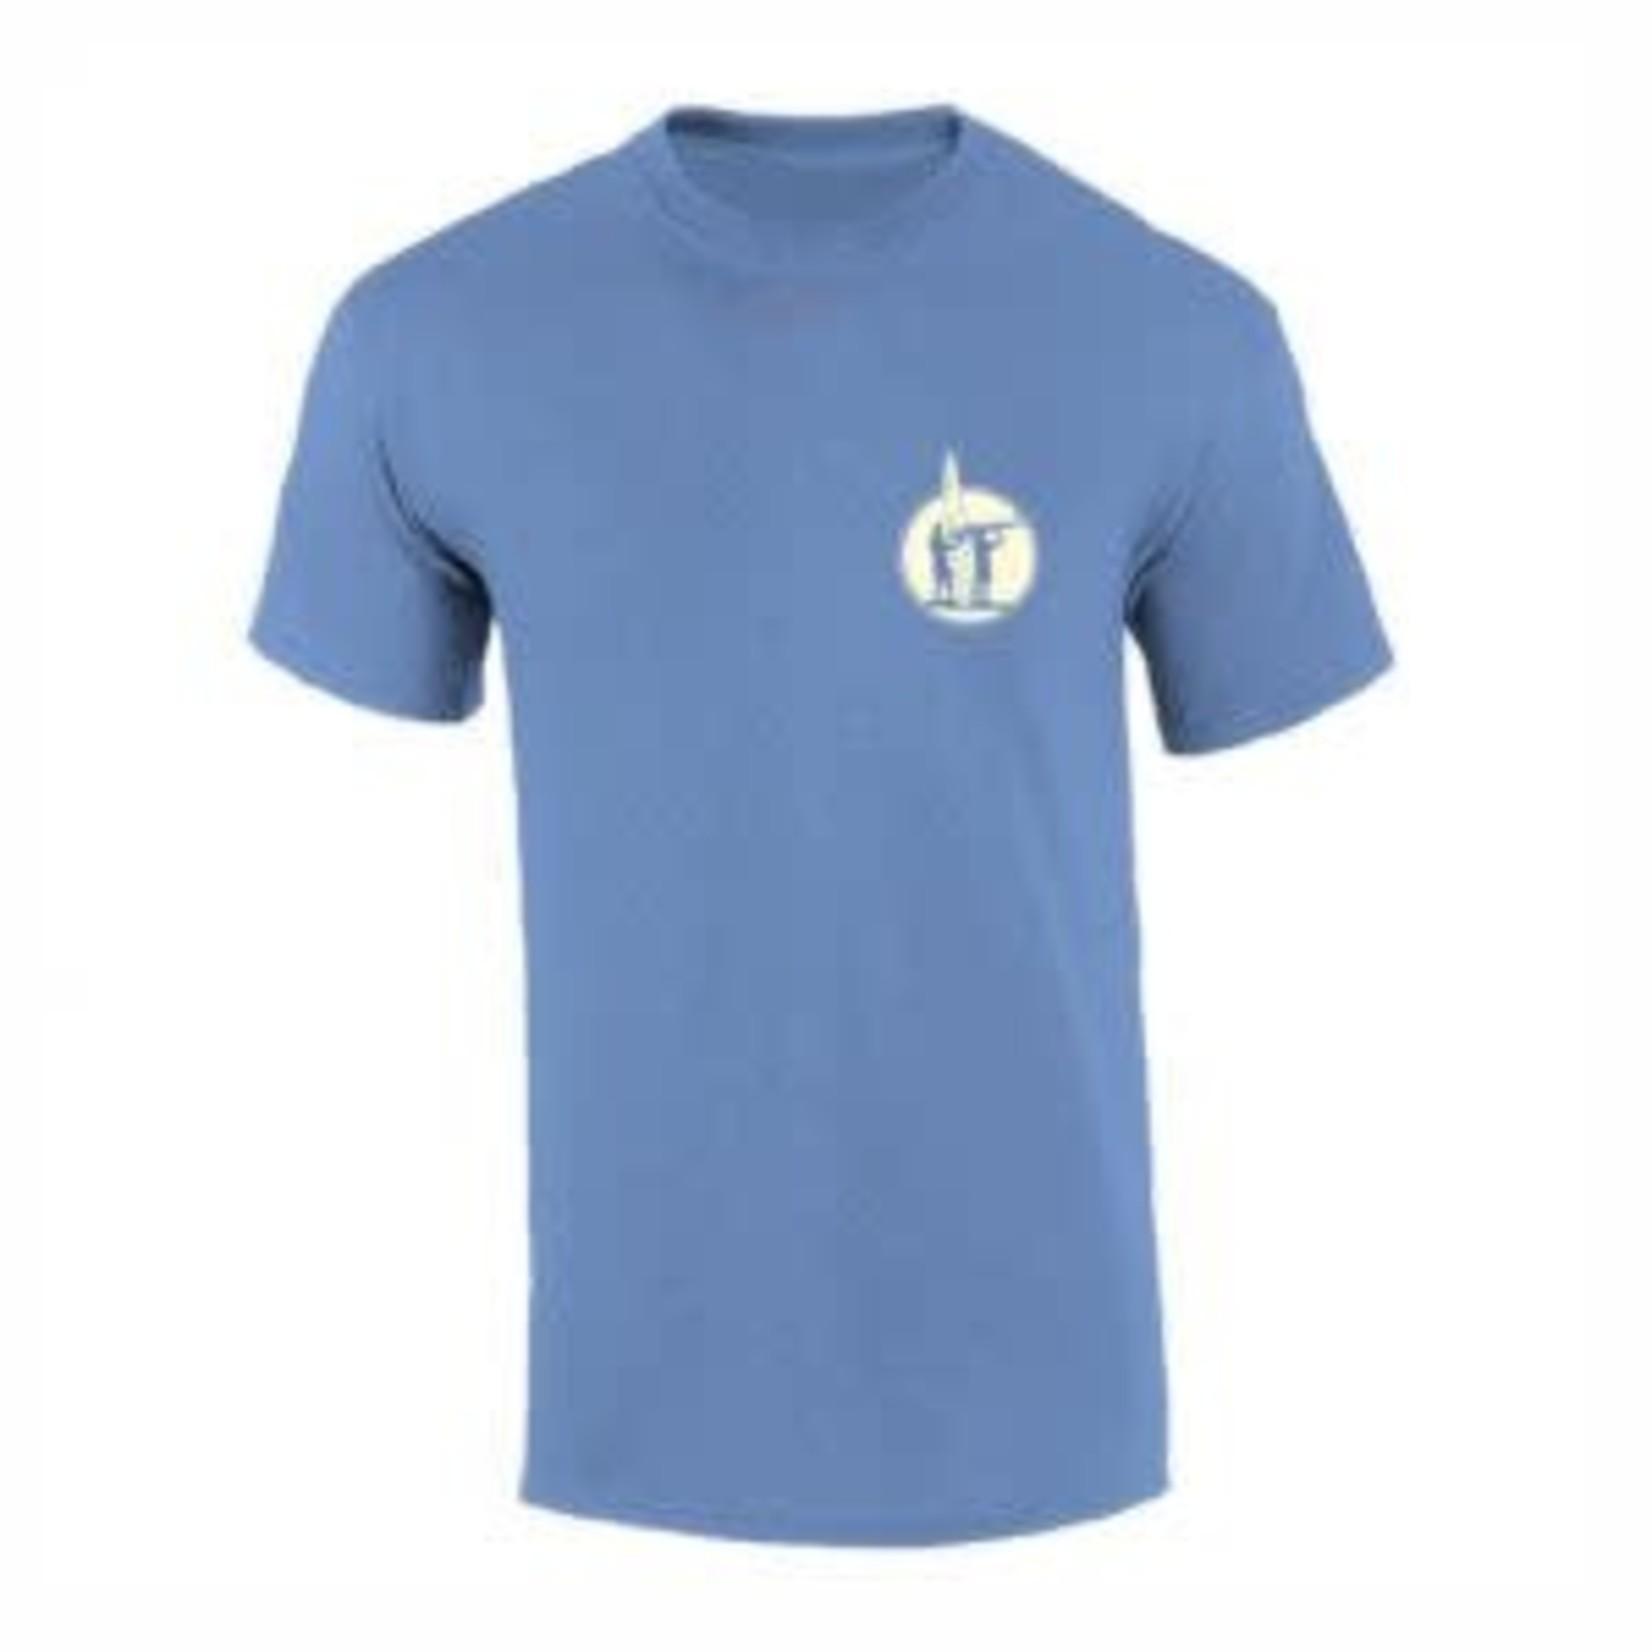 Island Surf Company ISC Painter Shirts.